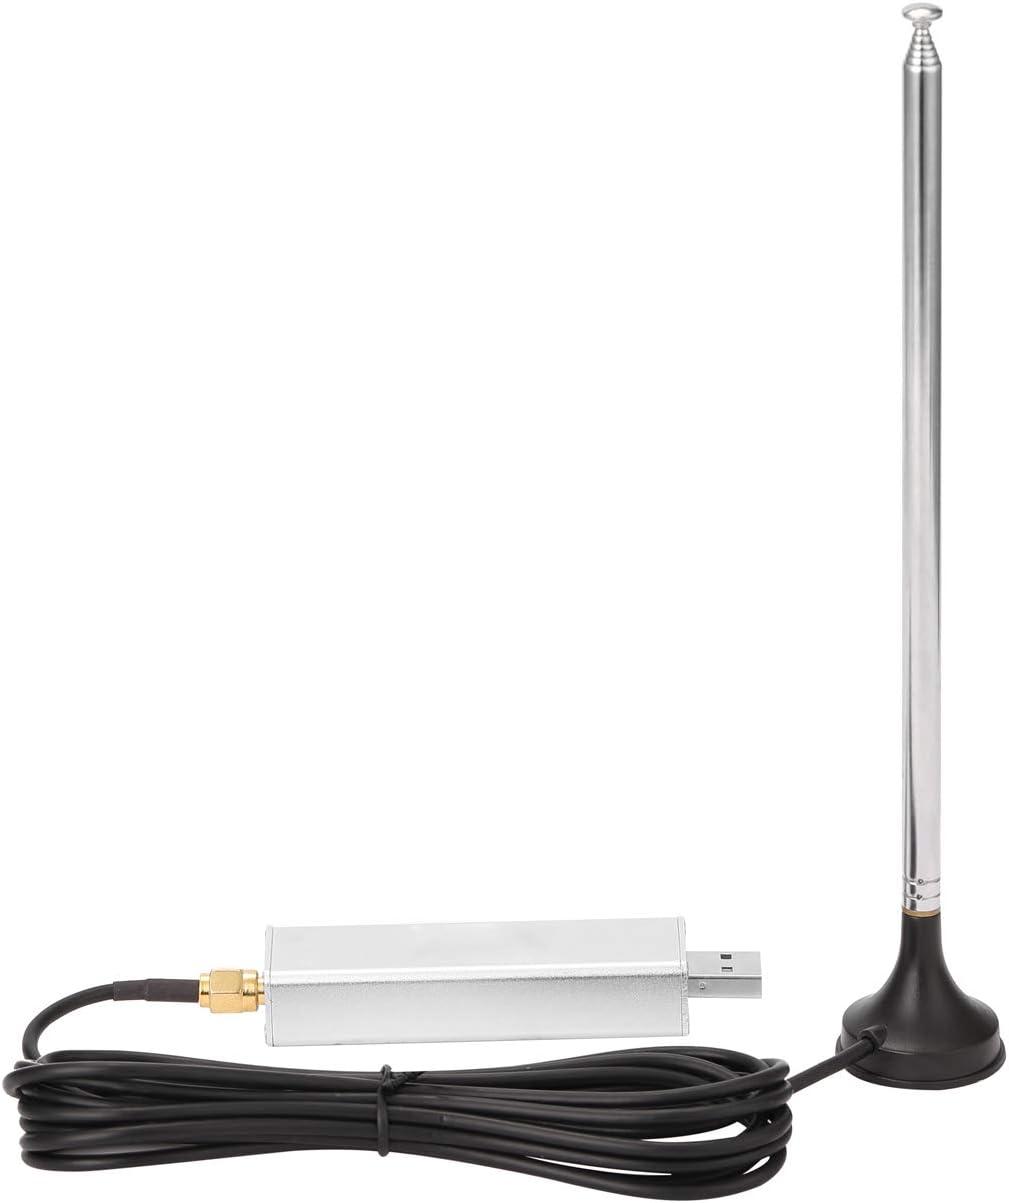 RTL2832U + R820T2 0,1 MHz-1,7 GHz TCXO ADSB UHF VHF FM RTL ...